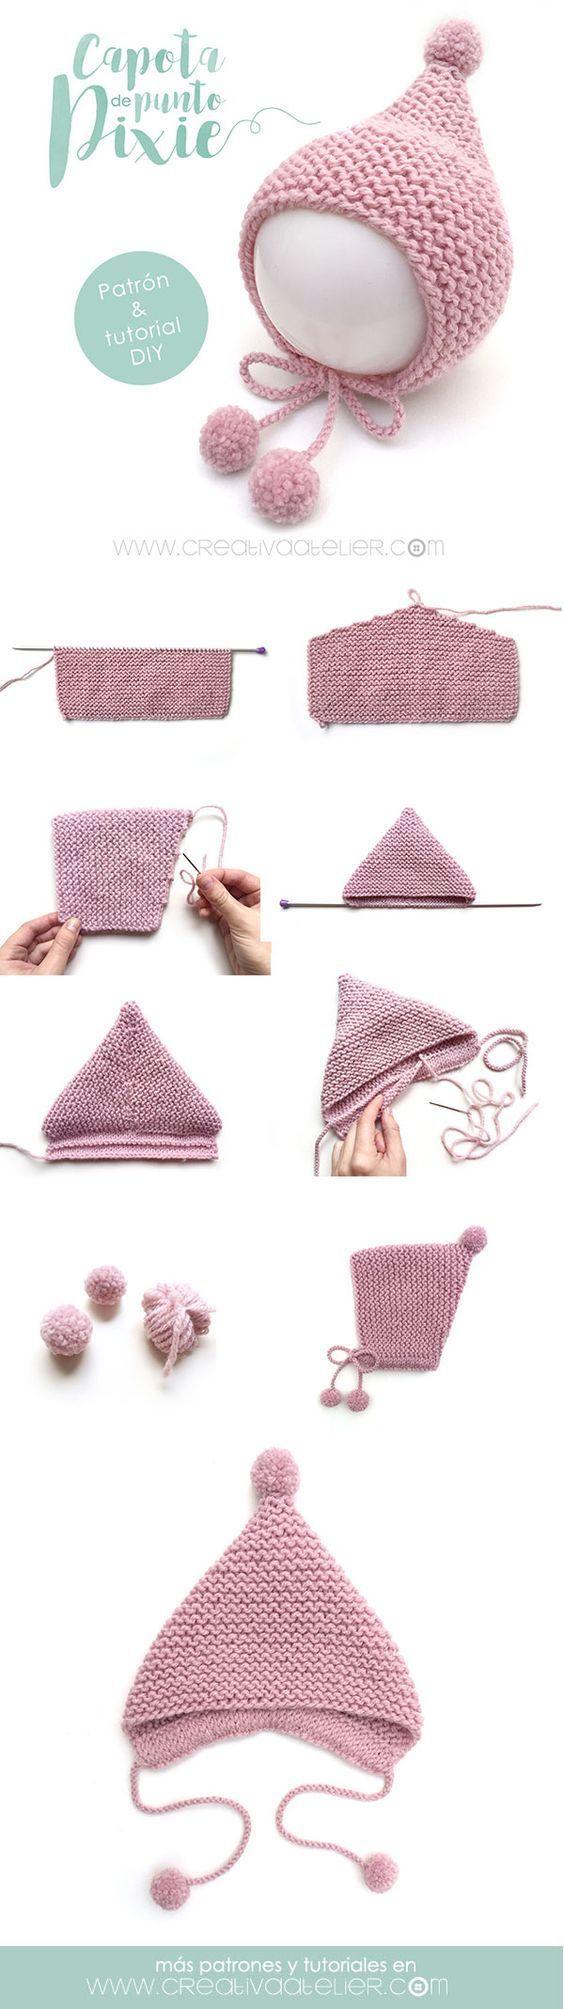 M s de 10 ideas incre bles sobre perchas para sombreros en - Perchero para sombreros ...